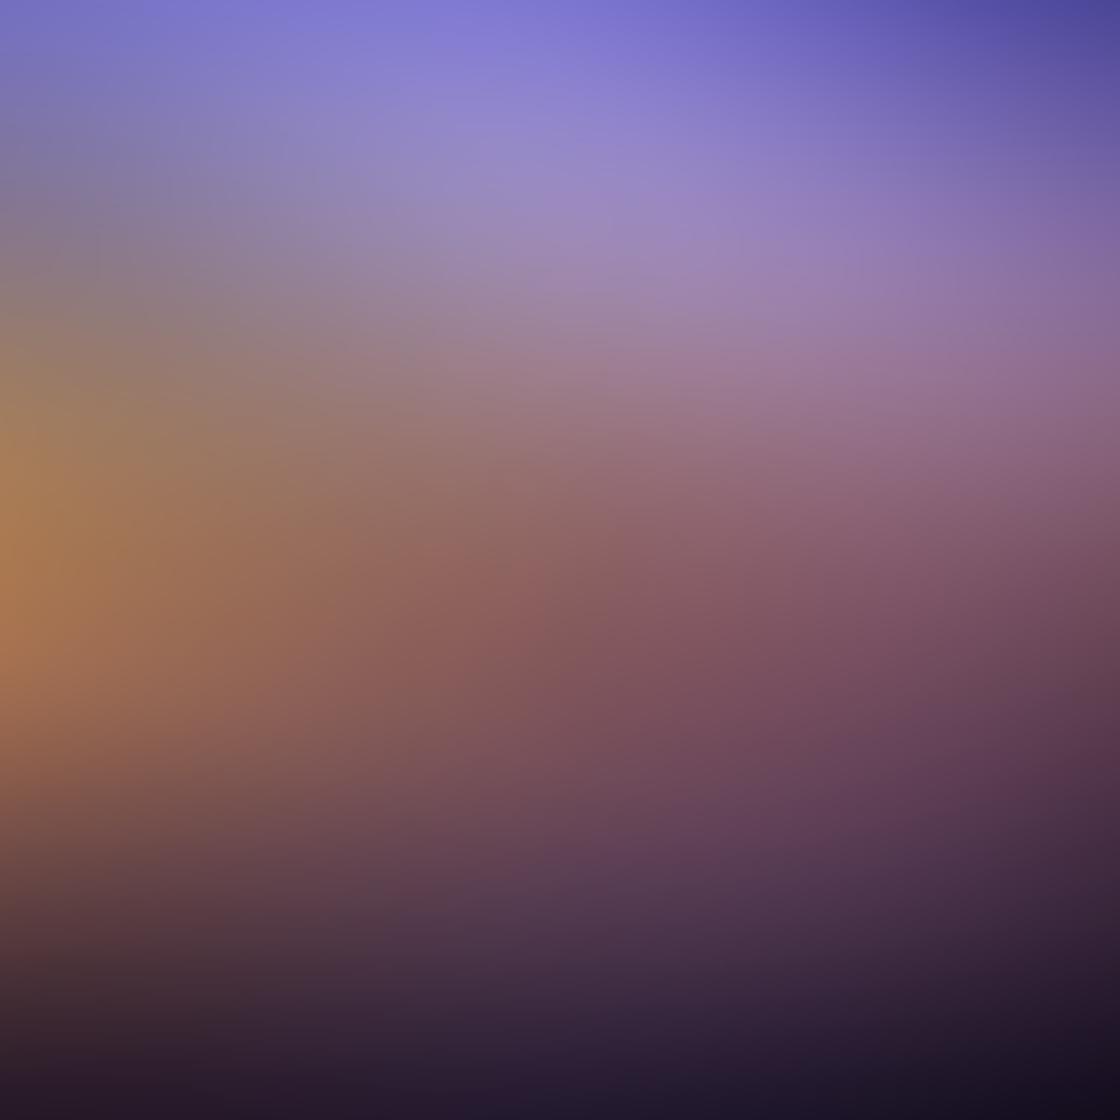 iPhone Silhouette Photos 13